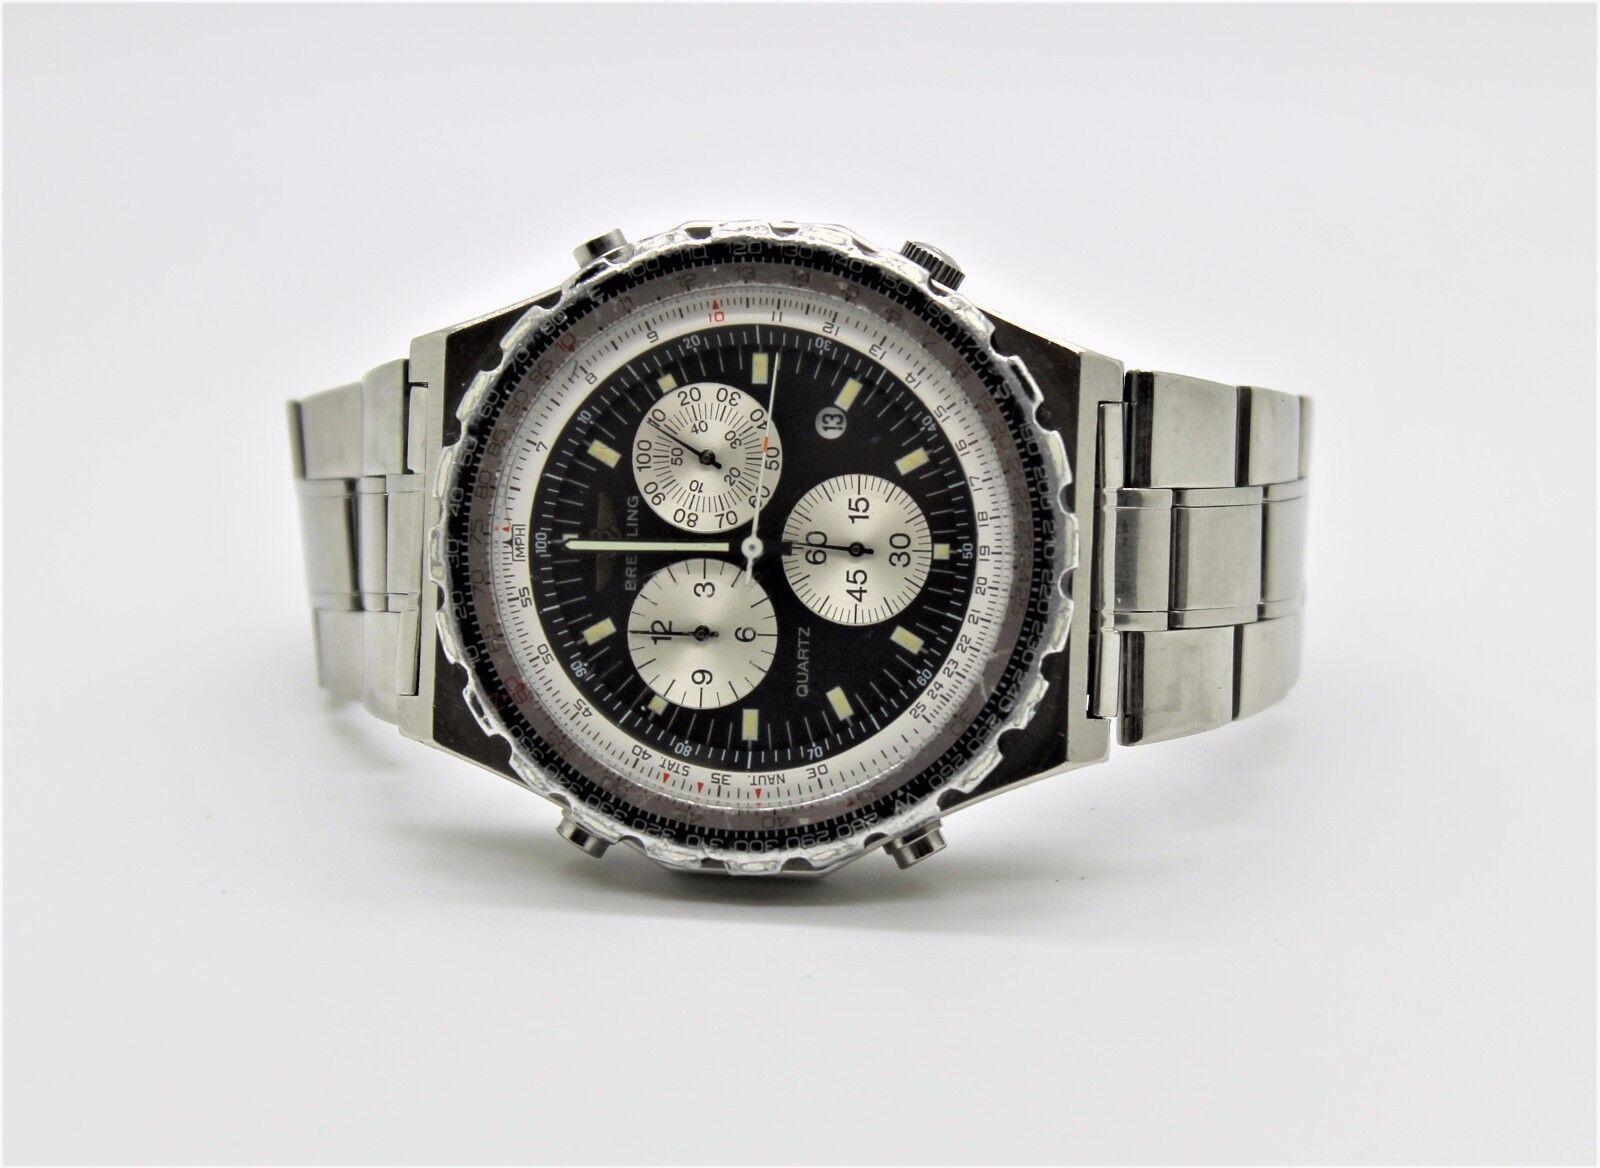 $1450.00 - Rare Breitling Navitimer - Jupiter Pilot's Chronograph Alarm Watch Model 80975